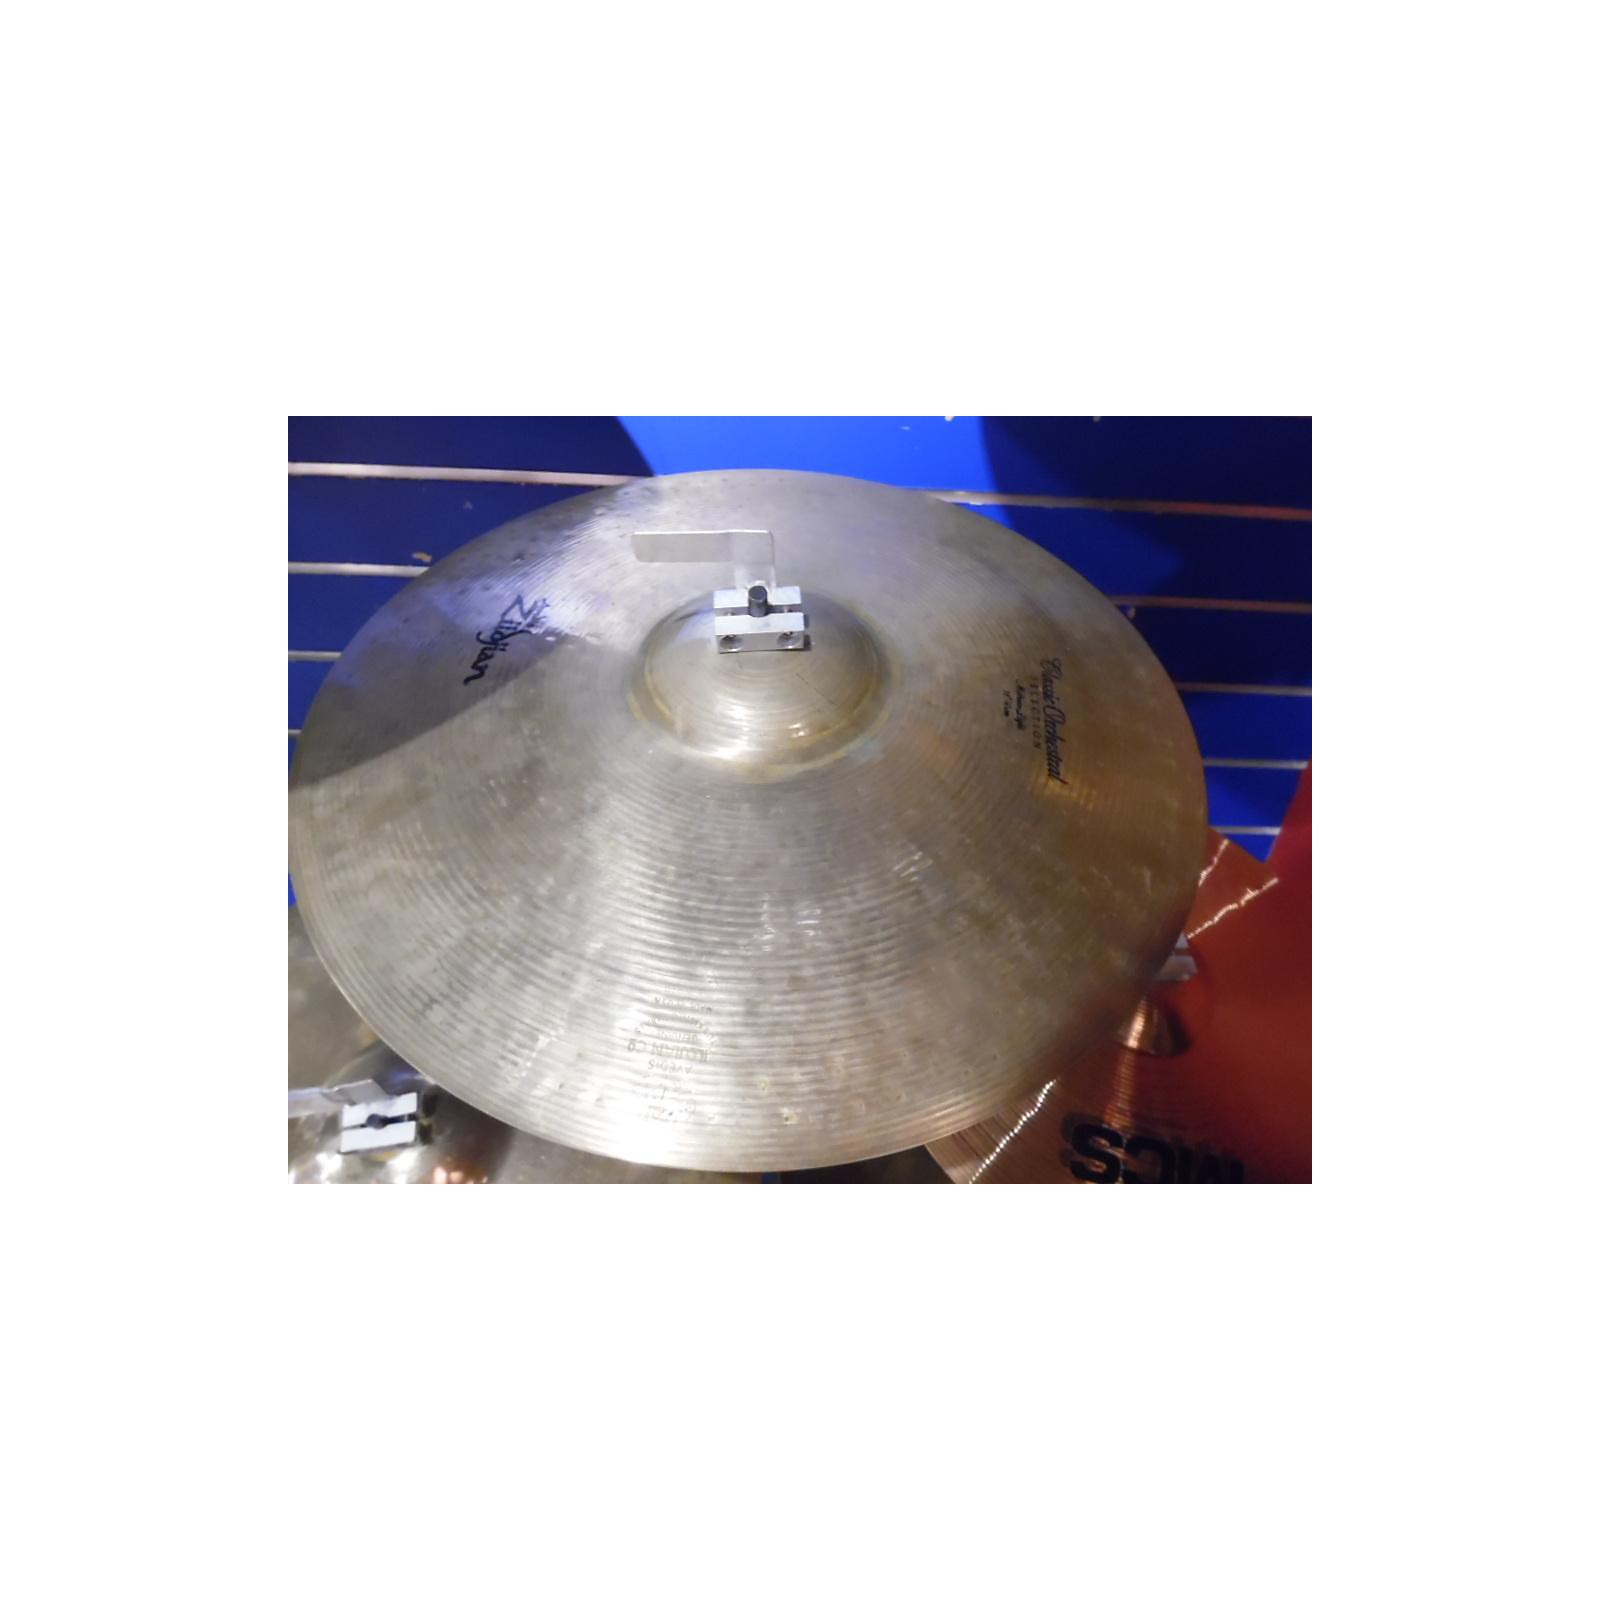 Zildjian 18in Classic Orchestral Medium Light Cymbal